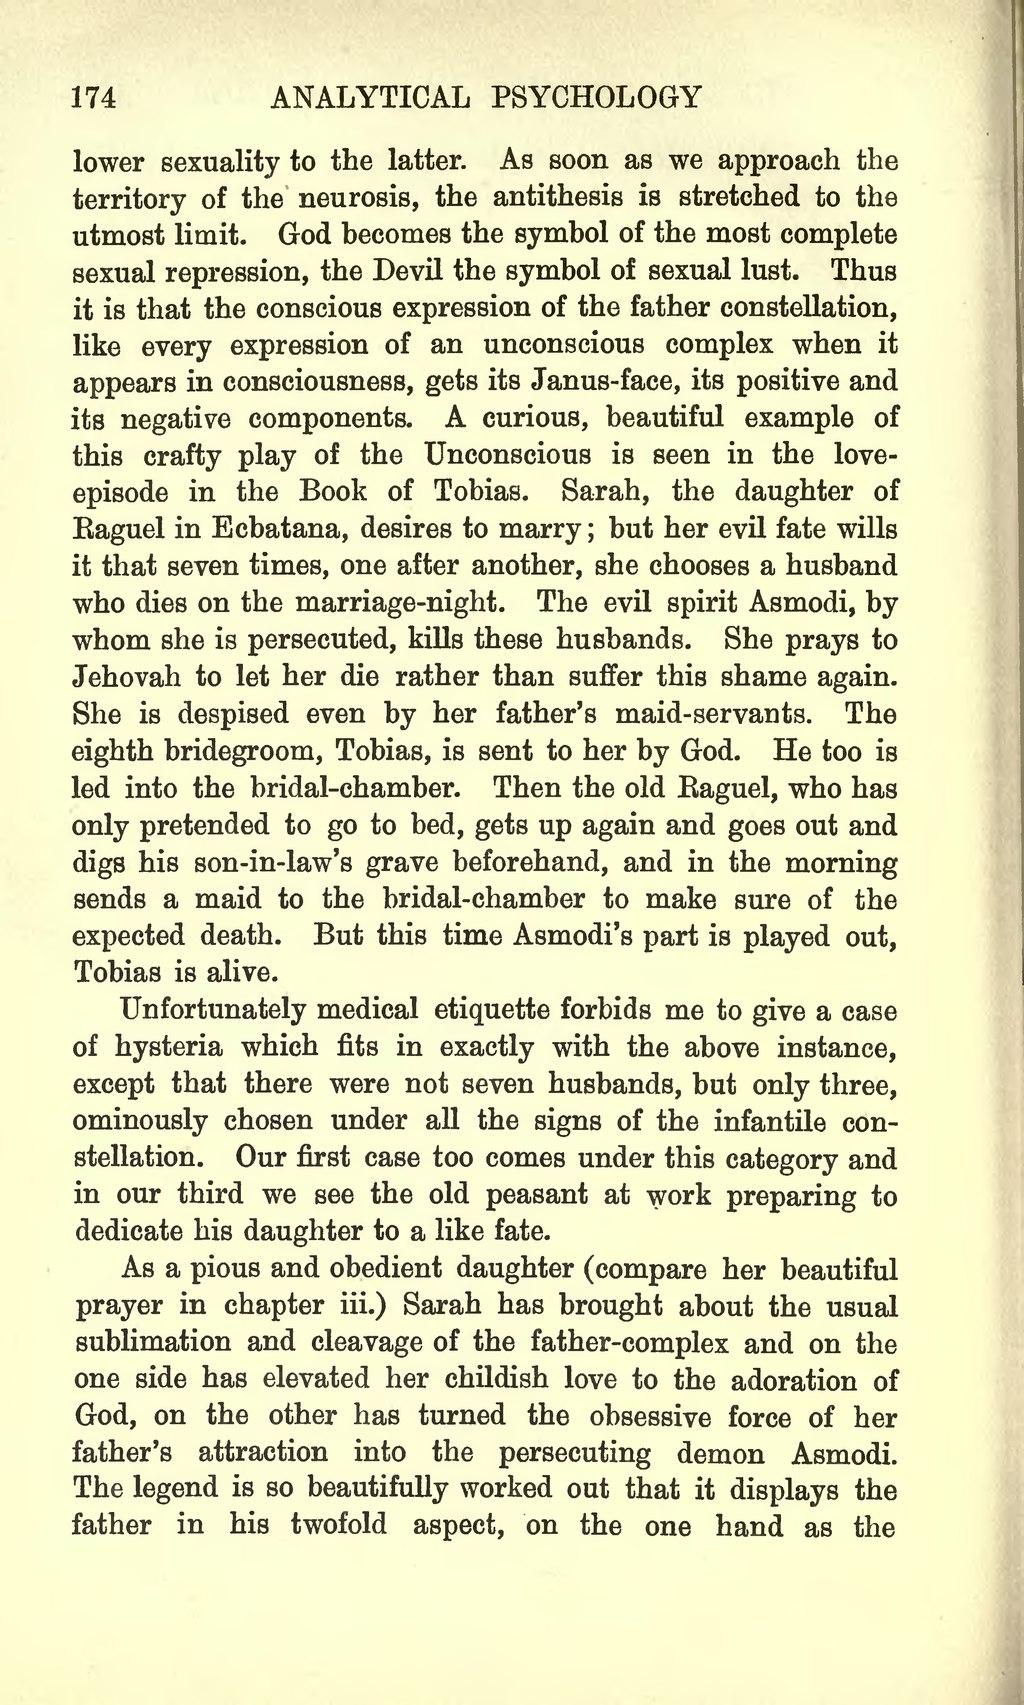 ebook The Poems of William Wordsworth,